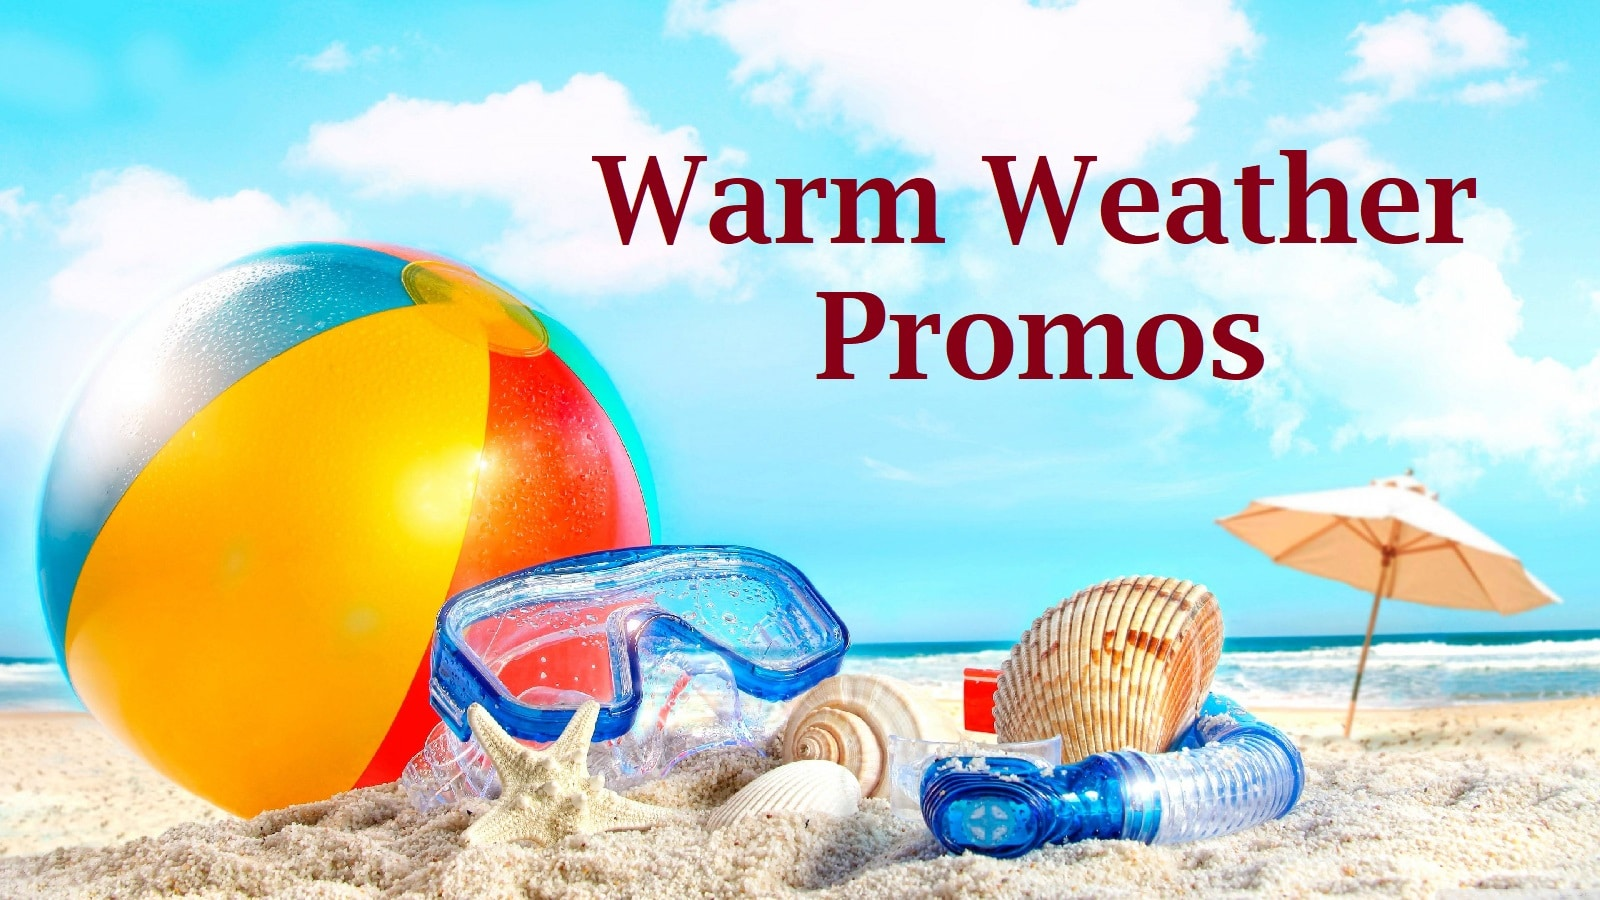 warm weather promos